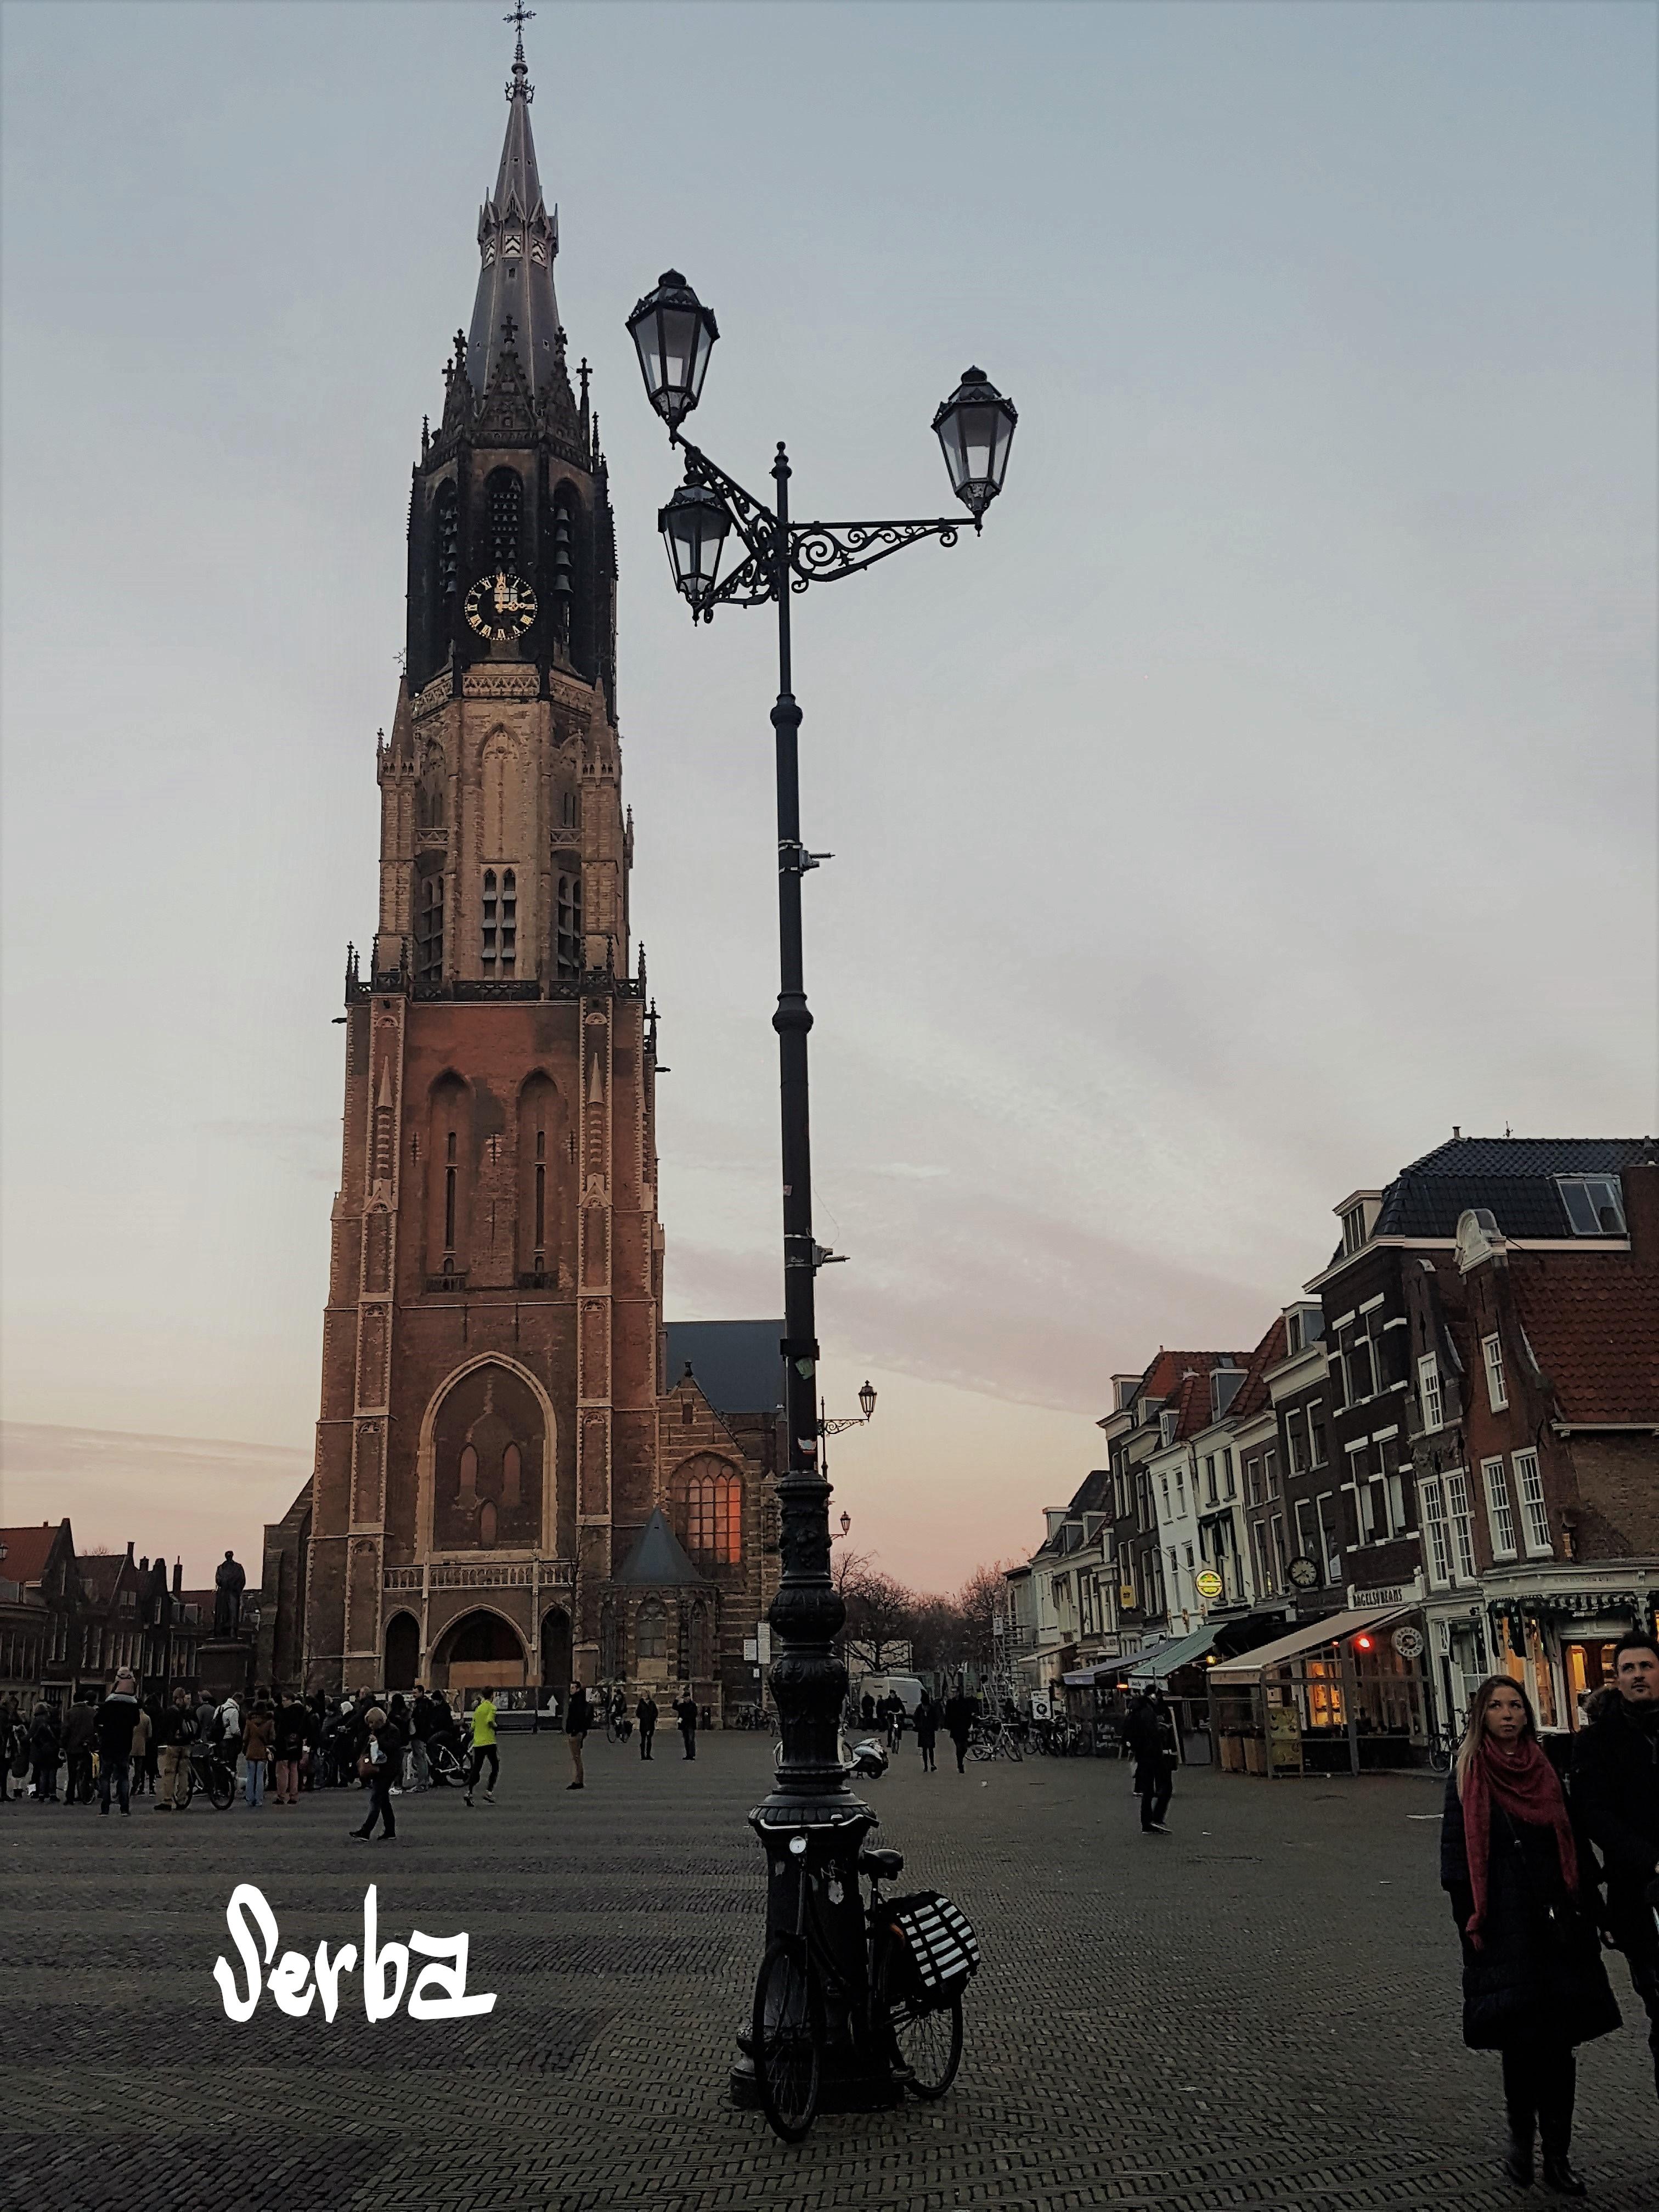 Alun-alun kota Delft, Delft Kota Keramik, Vermeer, Delft Blue, New Church. Pemandu Wisata orang Indonesia di Belanda.